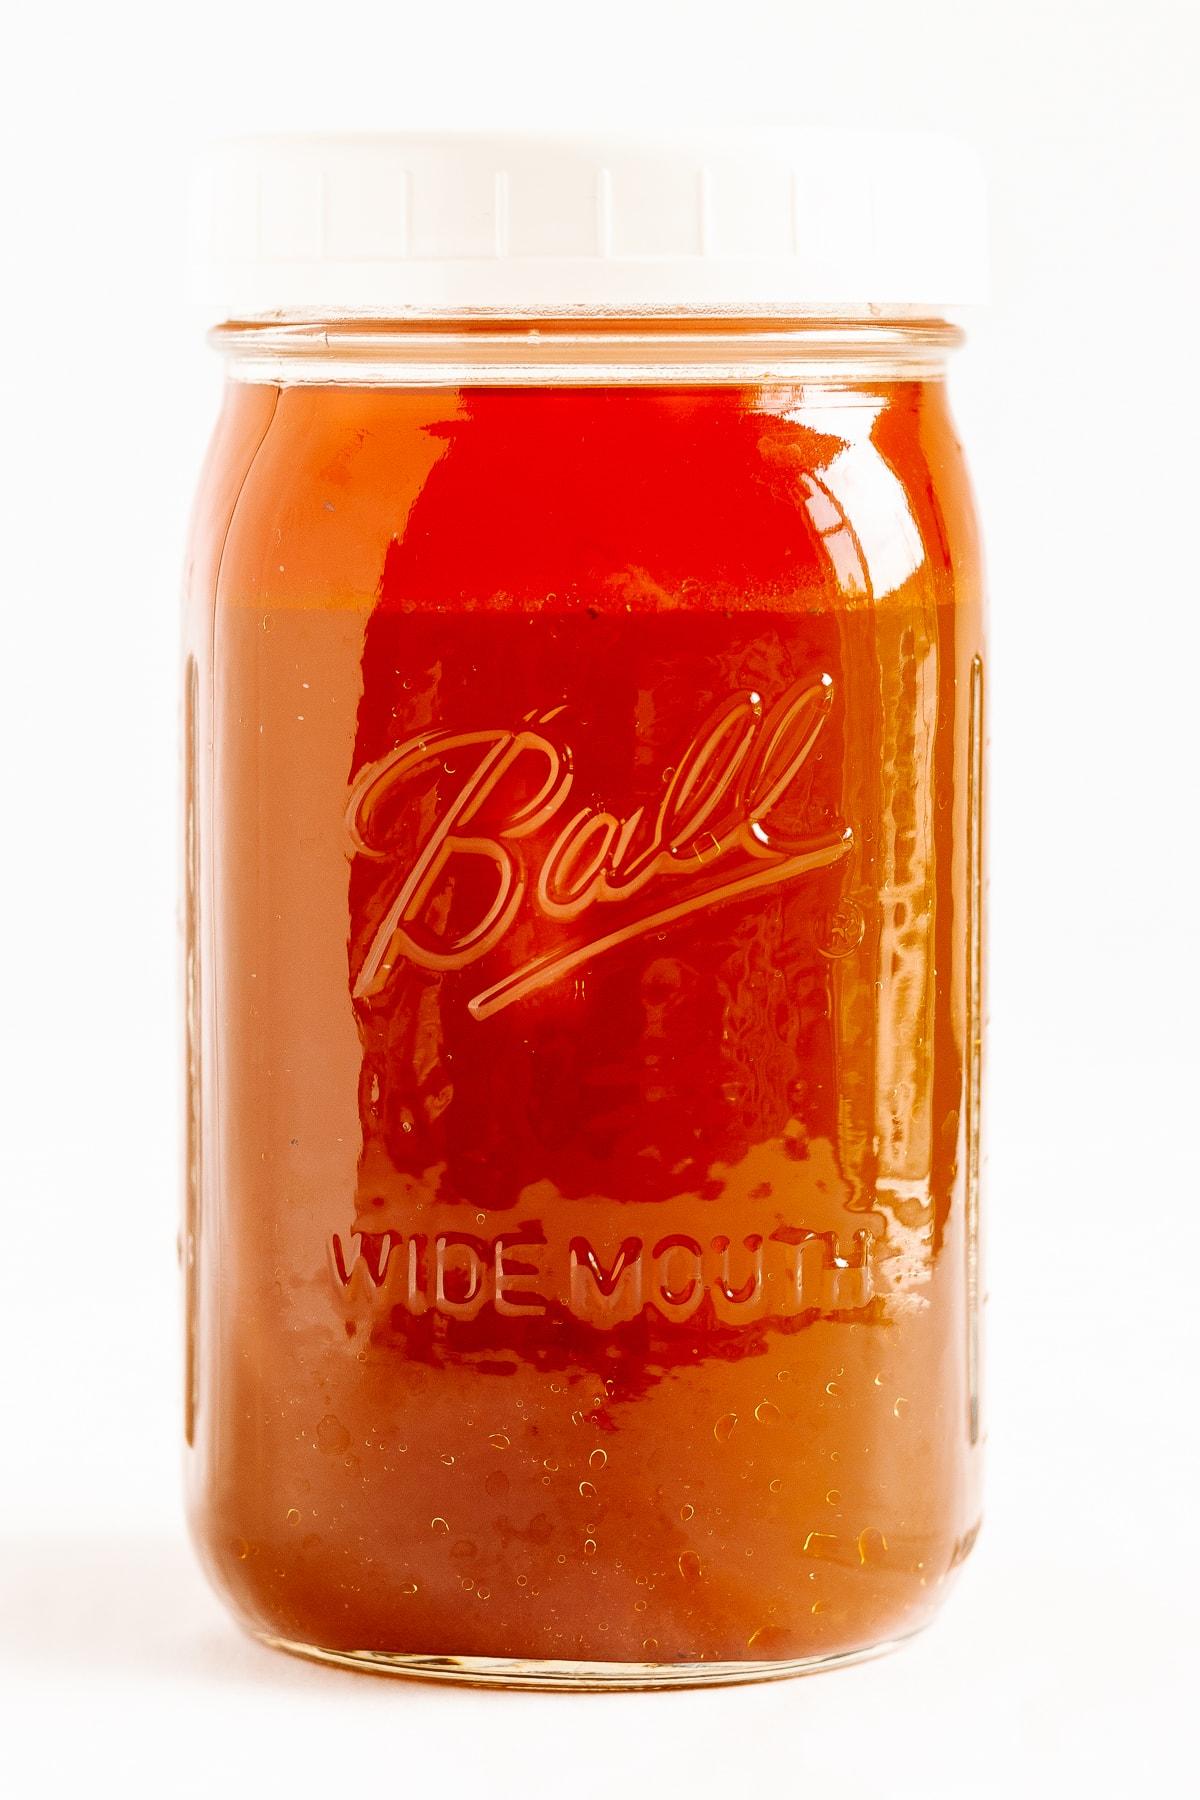 Mason jar of beef bone broth (stock) on a white background.